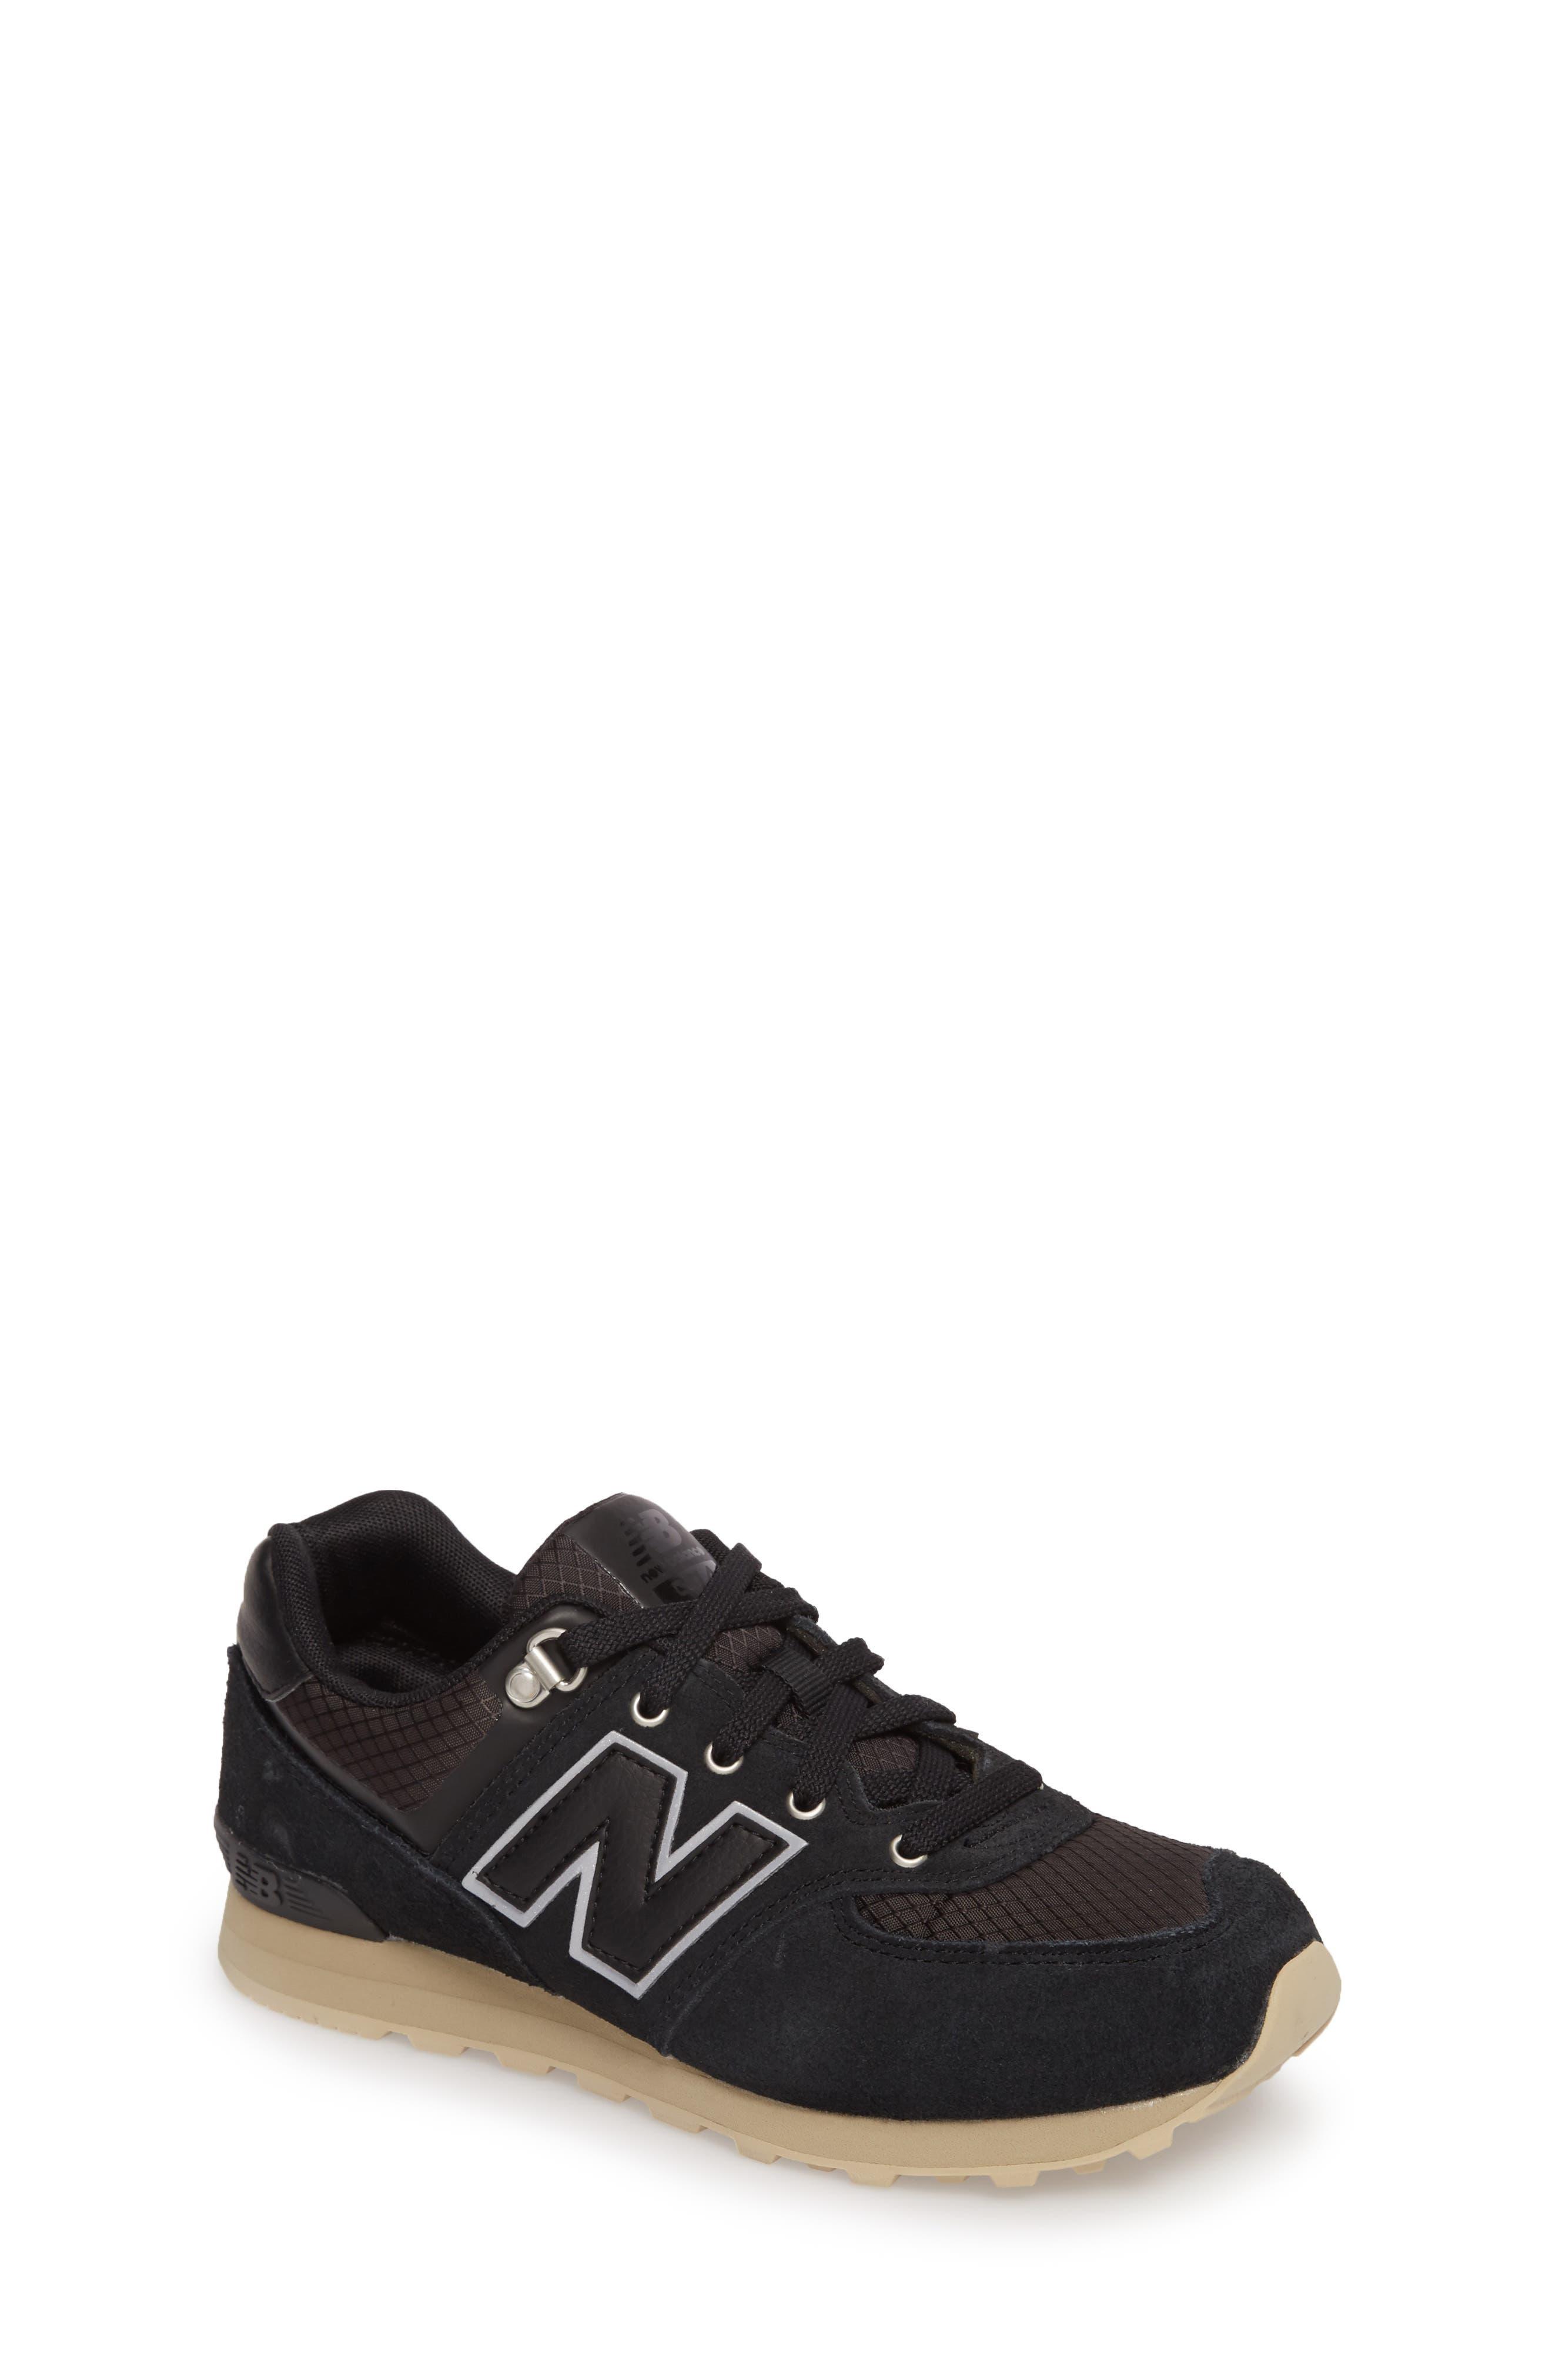 574 Sneaker,                             Main thumbnail 1, color,                             001